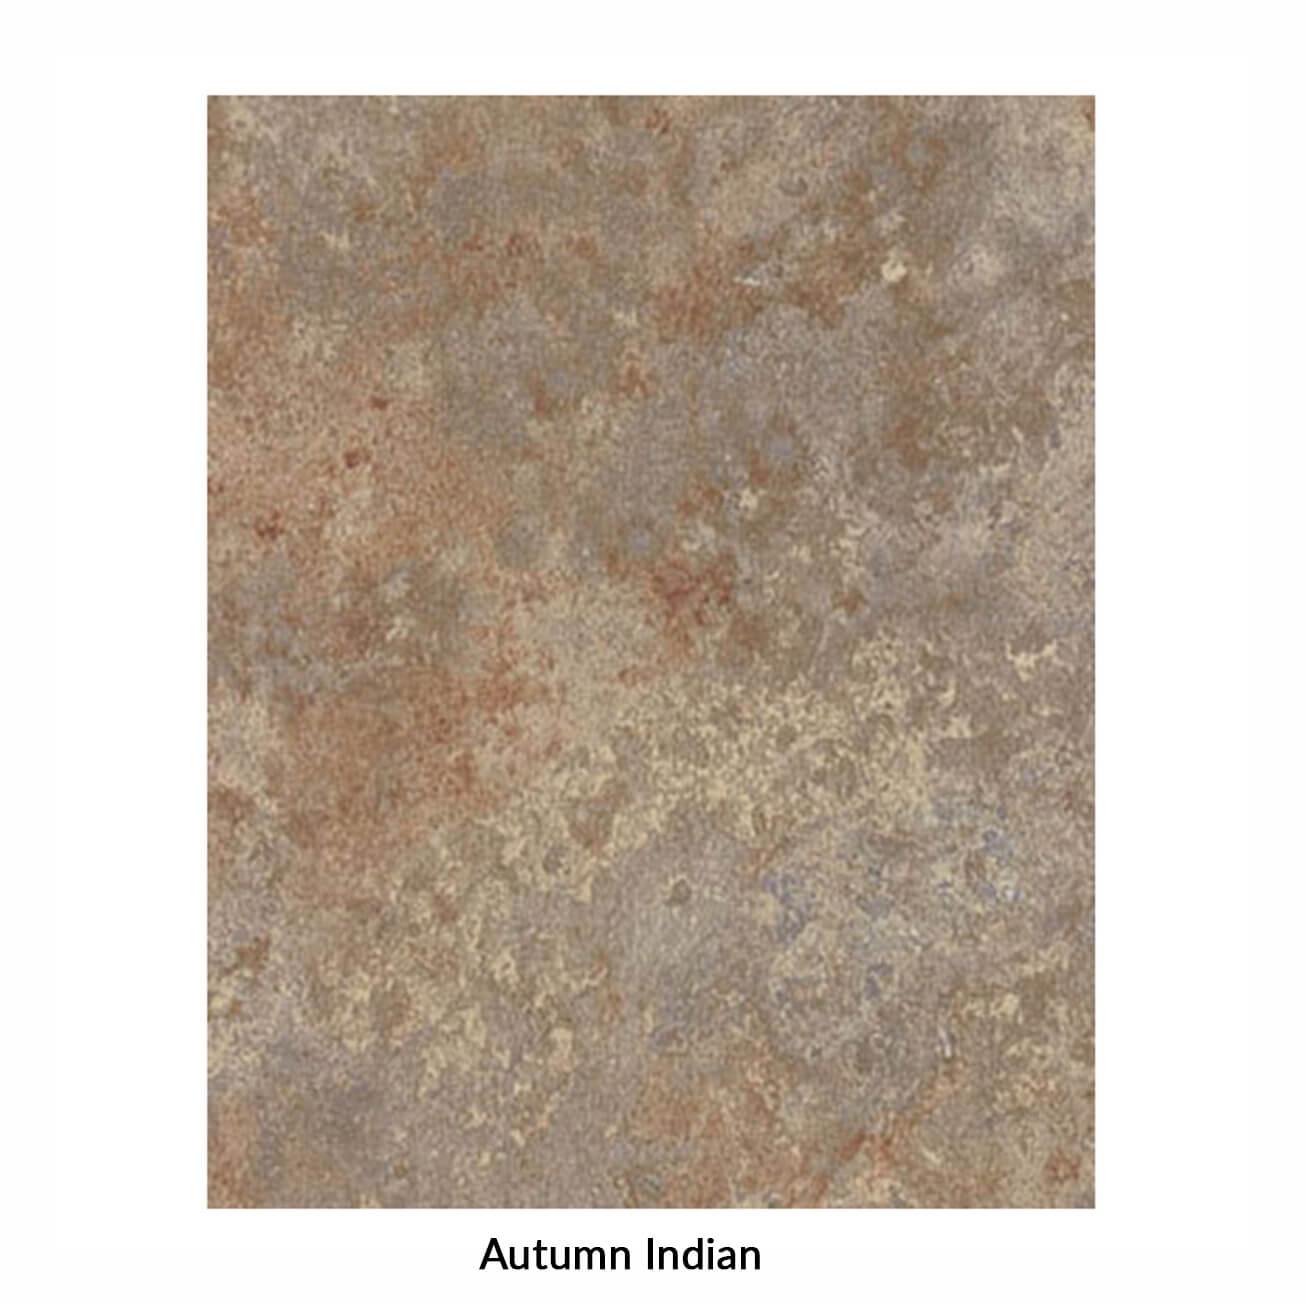 9-autumn-indian-slate.jpg